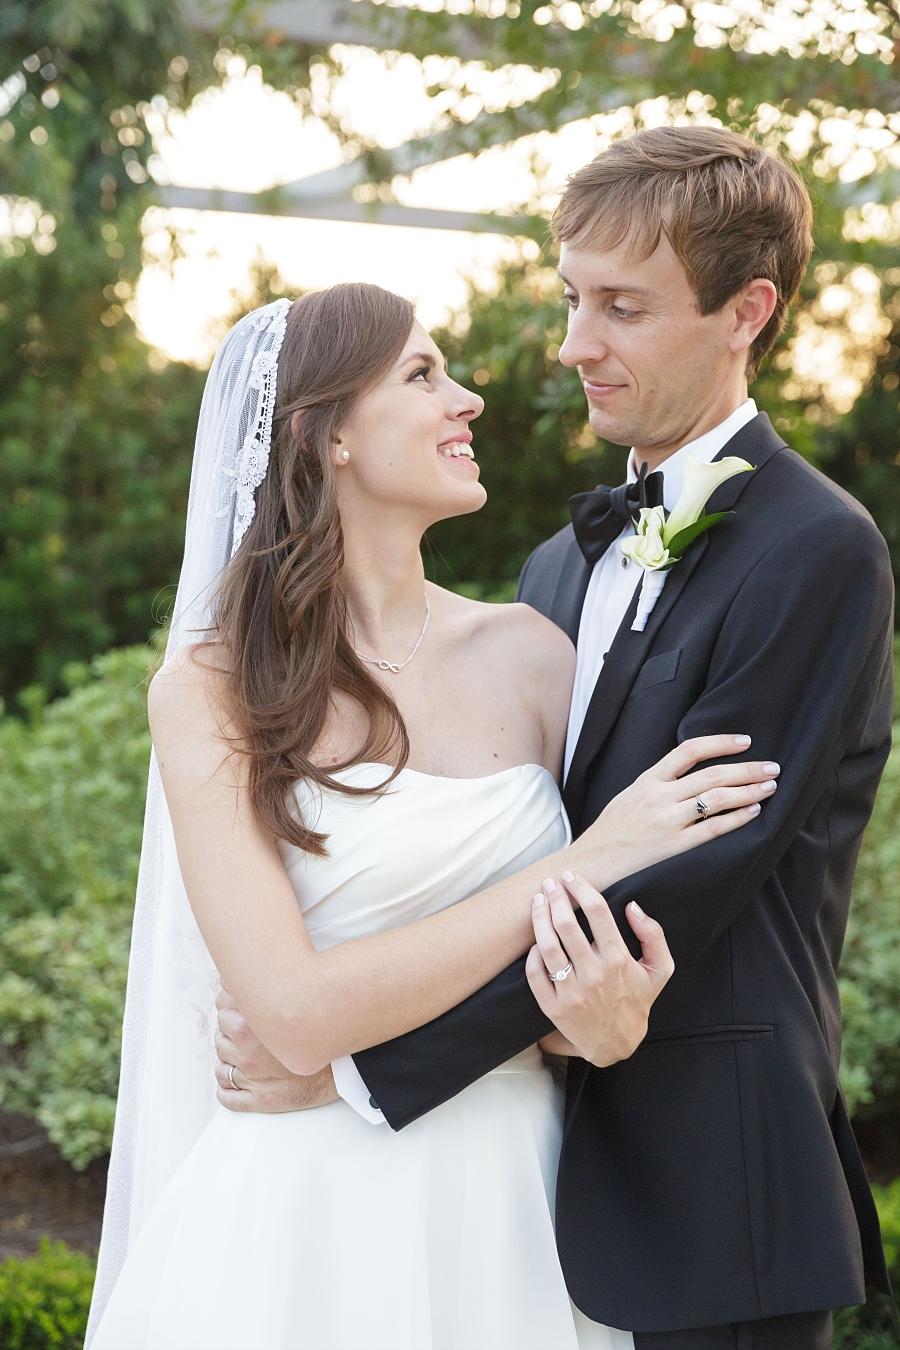 Stacy-Anderson-Photography-McGovern-Centennial-Gardens-Houston-Wedding-Photographer_0066.jpg